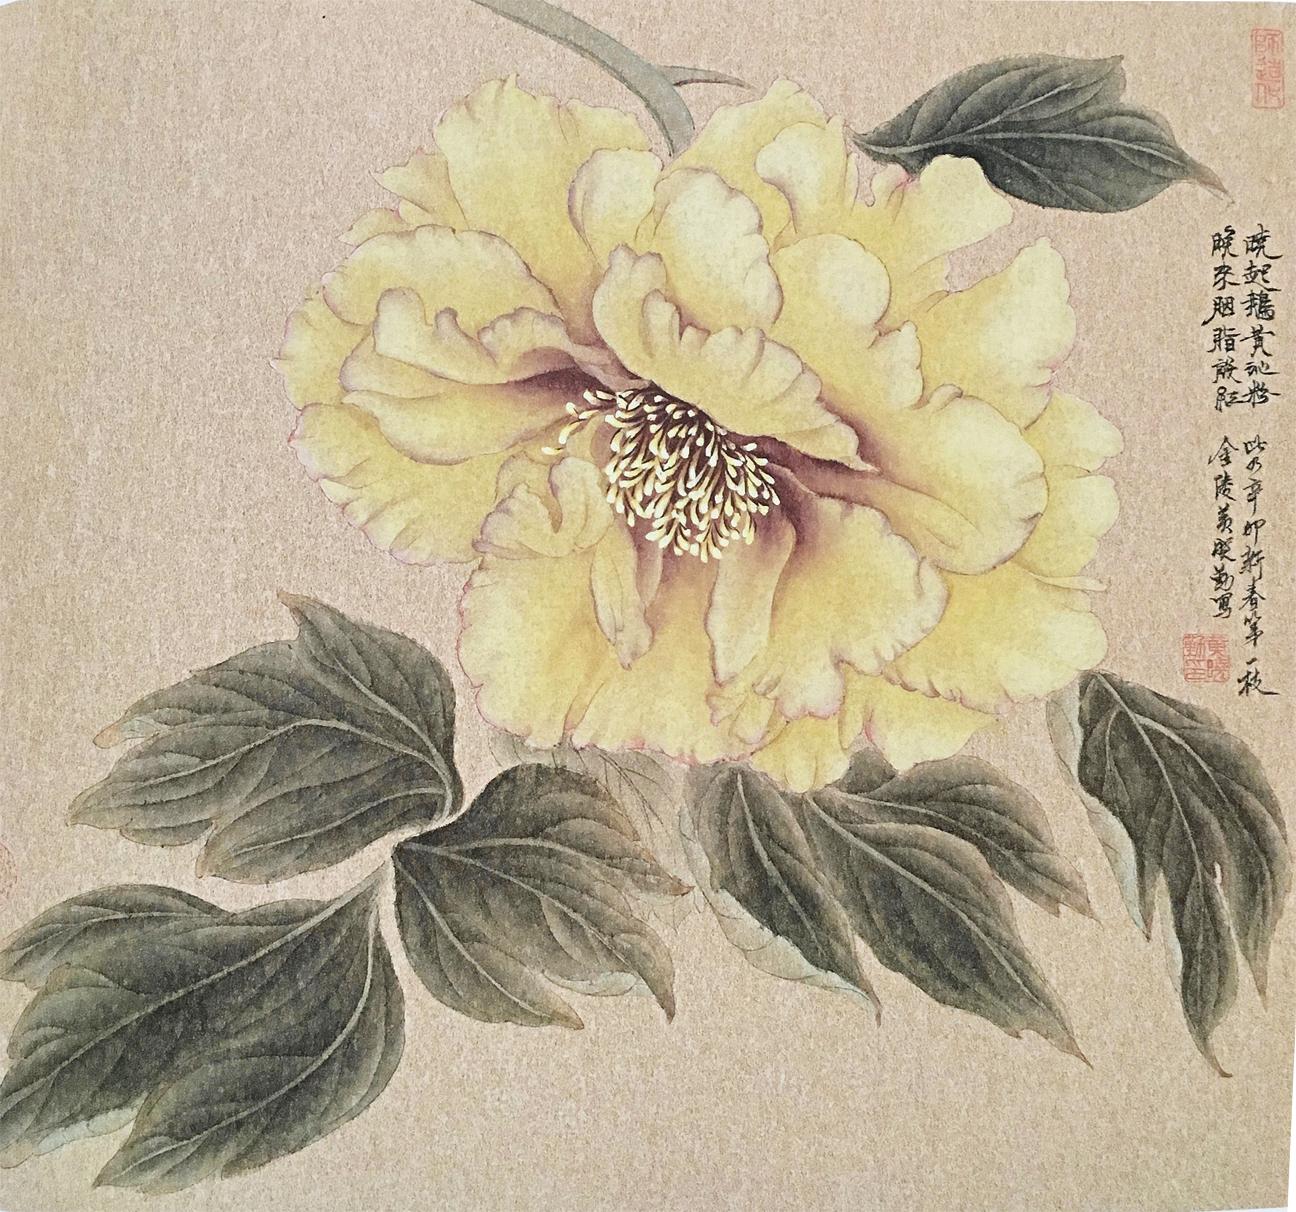 Yellow Peony Blossom